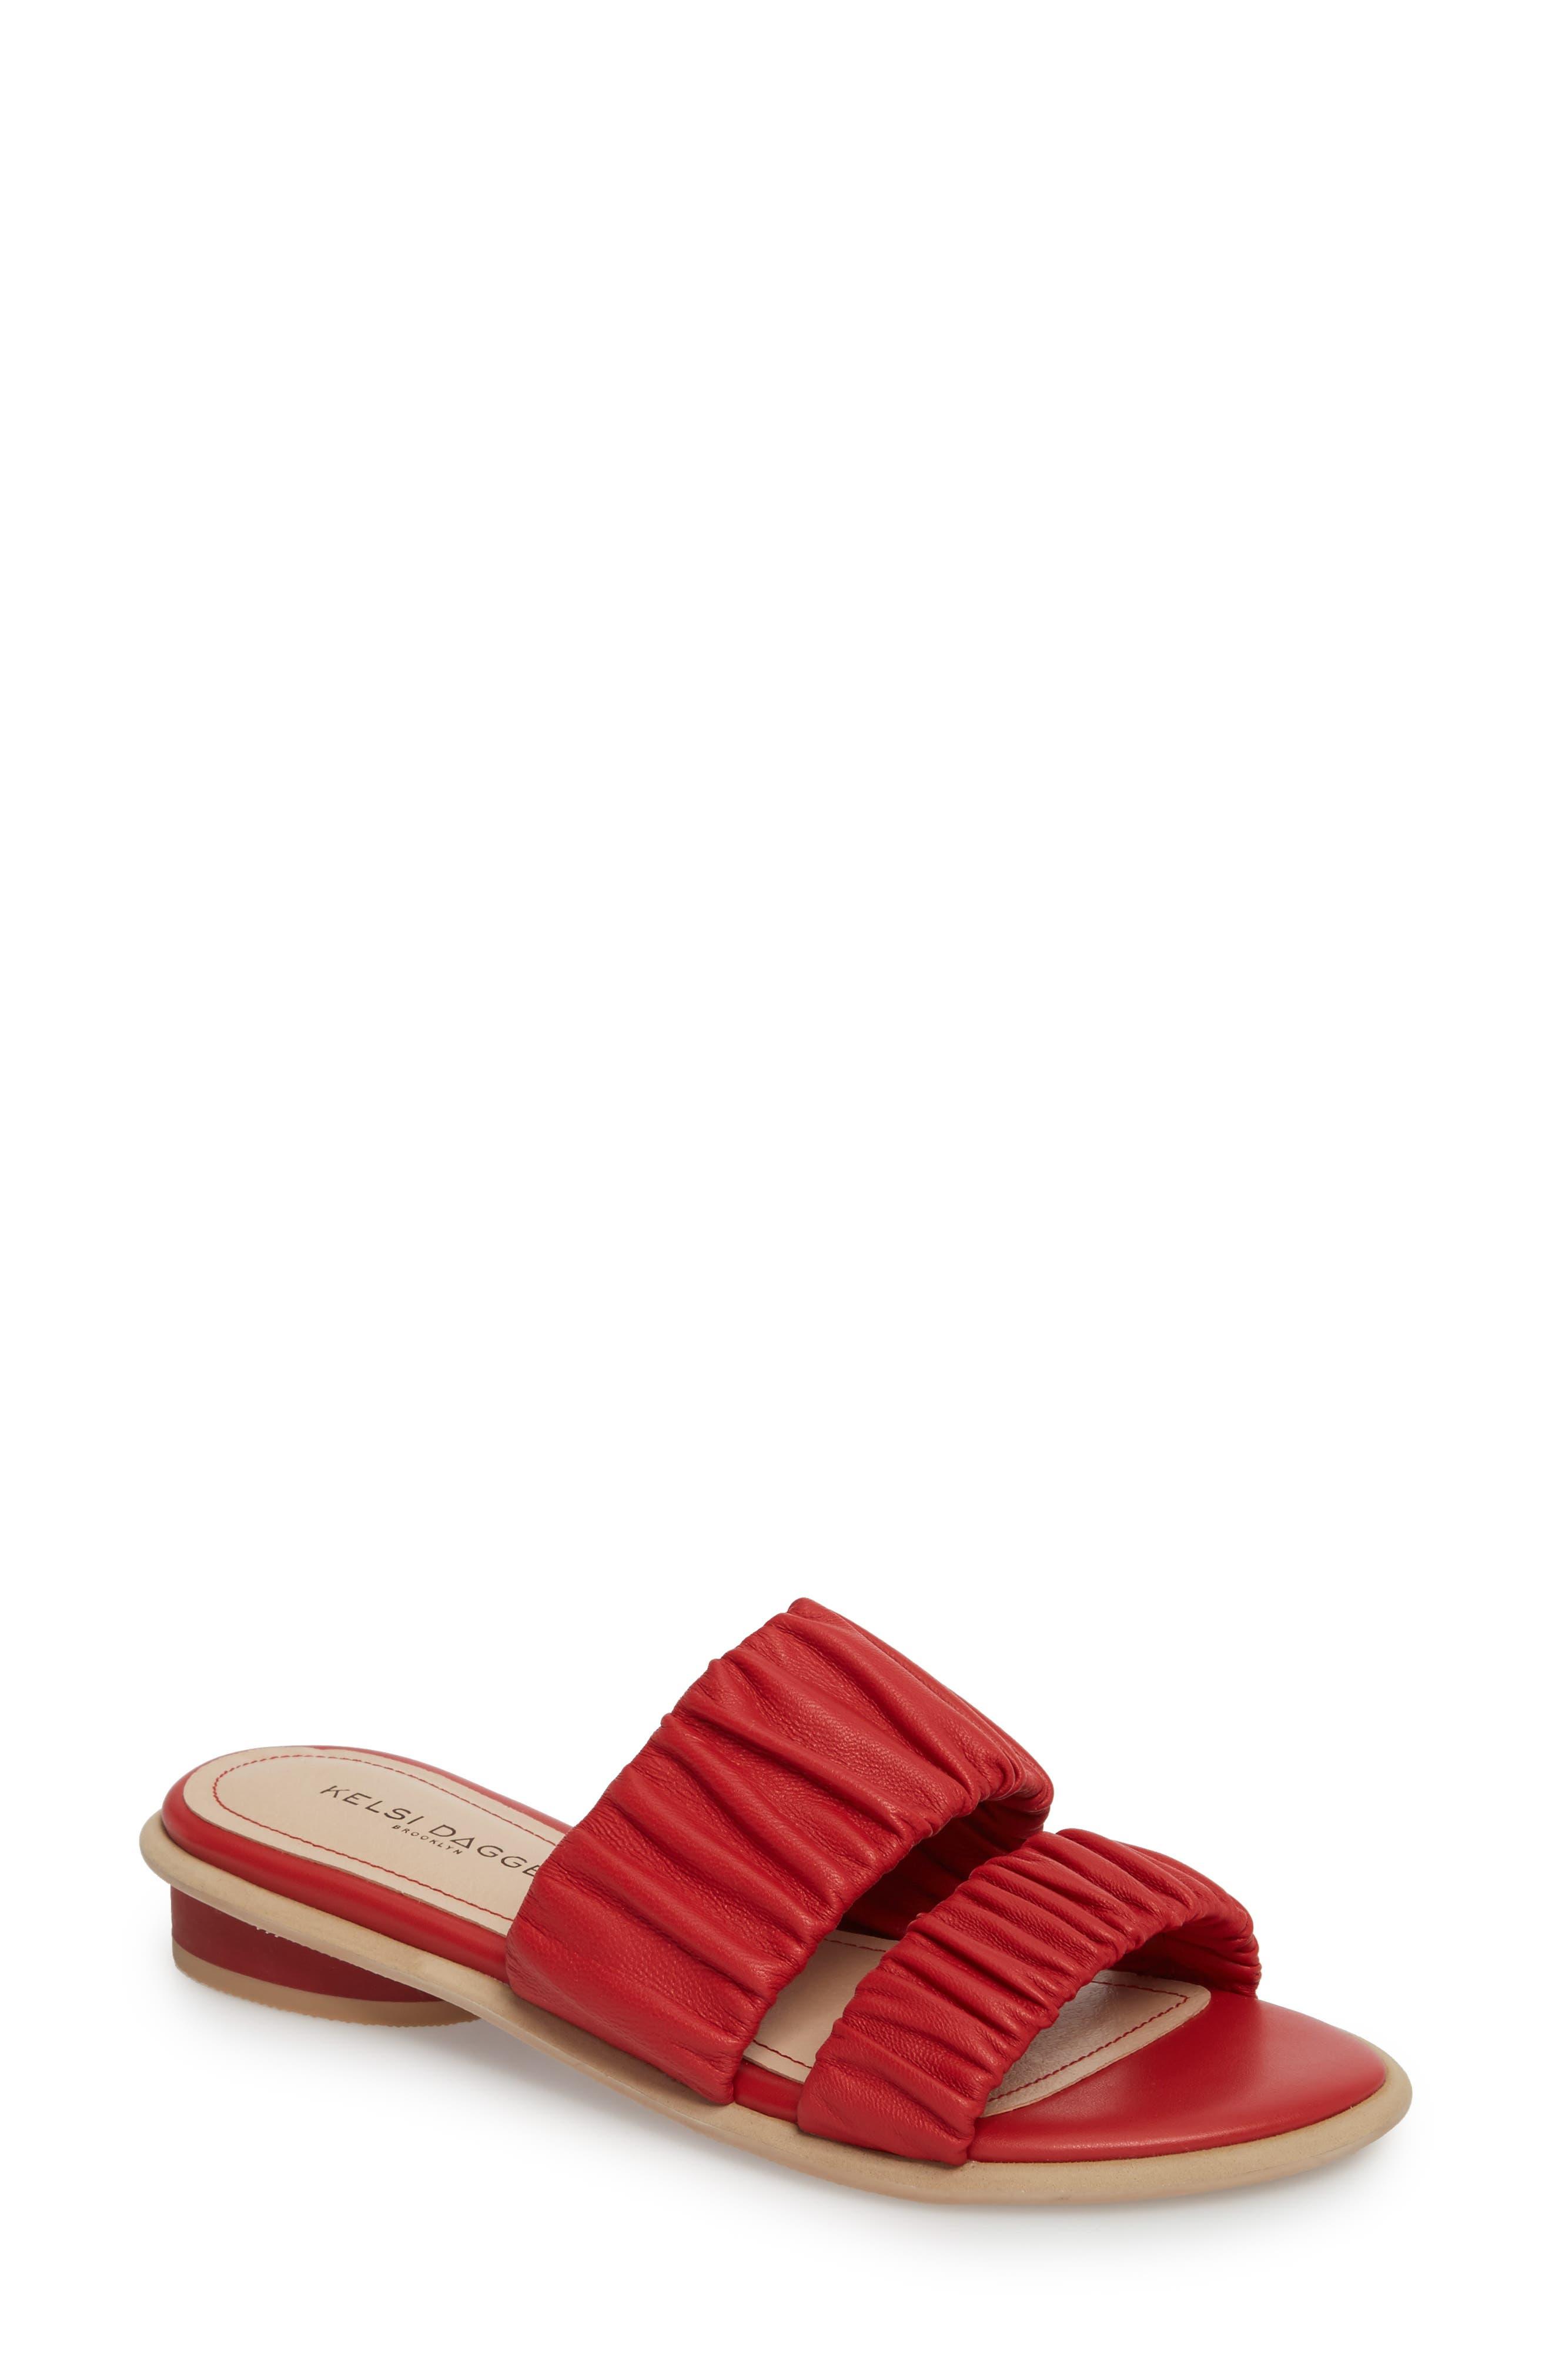 Kelsi Dagger Brooklyn Surf Slide Sandal (Women)